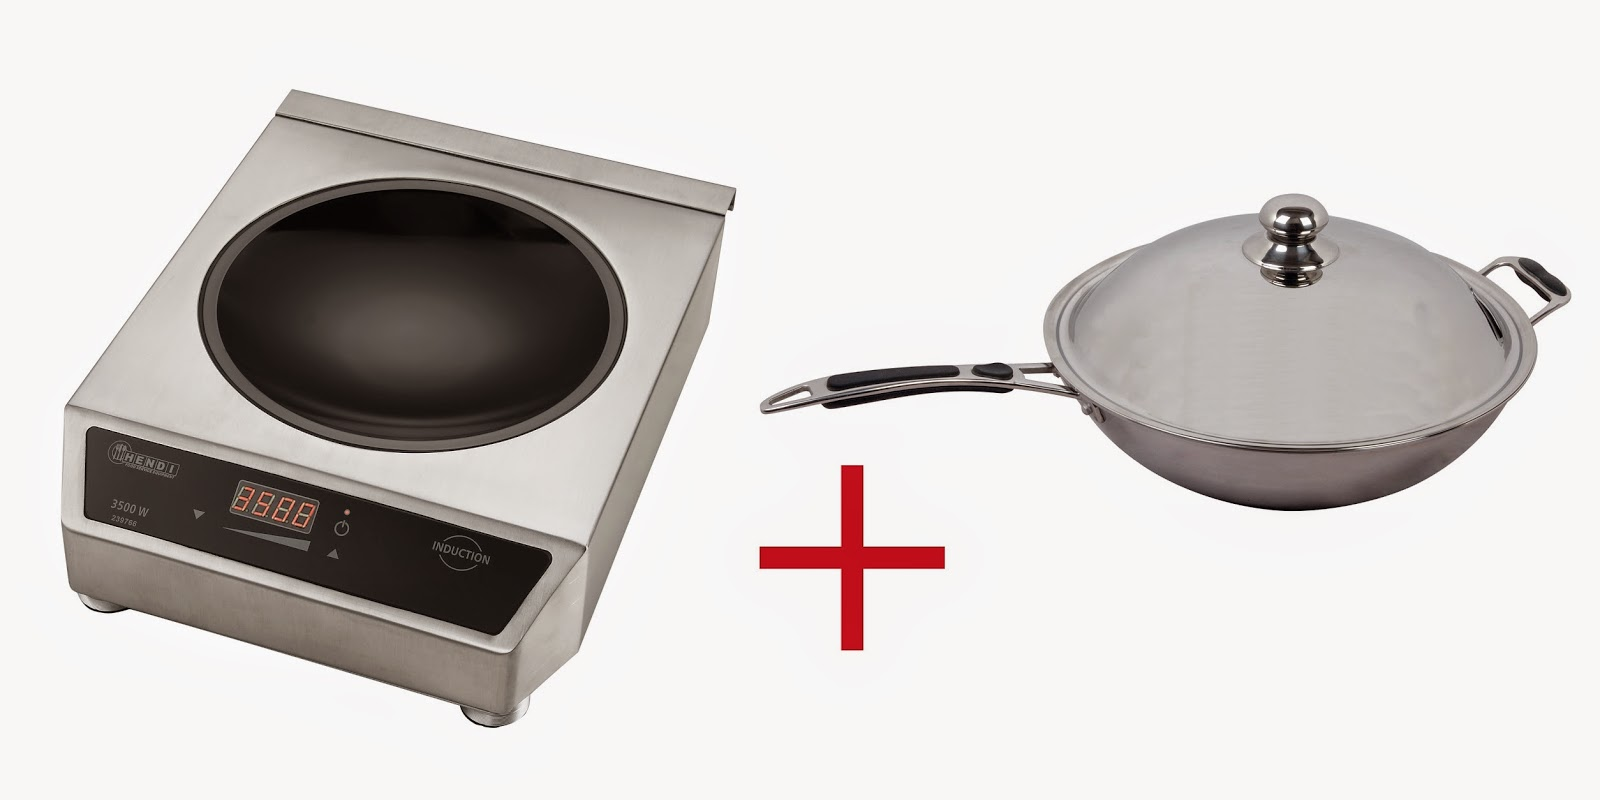 plita inductie wok, plita inductie 1 ochi, plita cu inductie, pret,